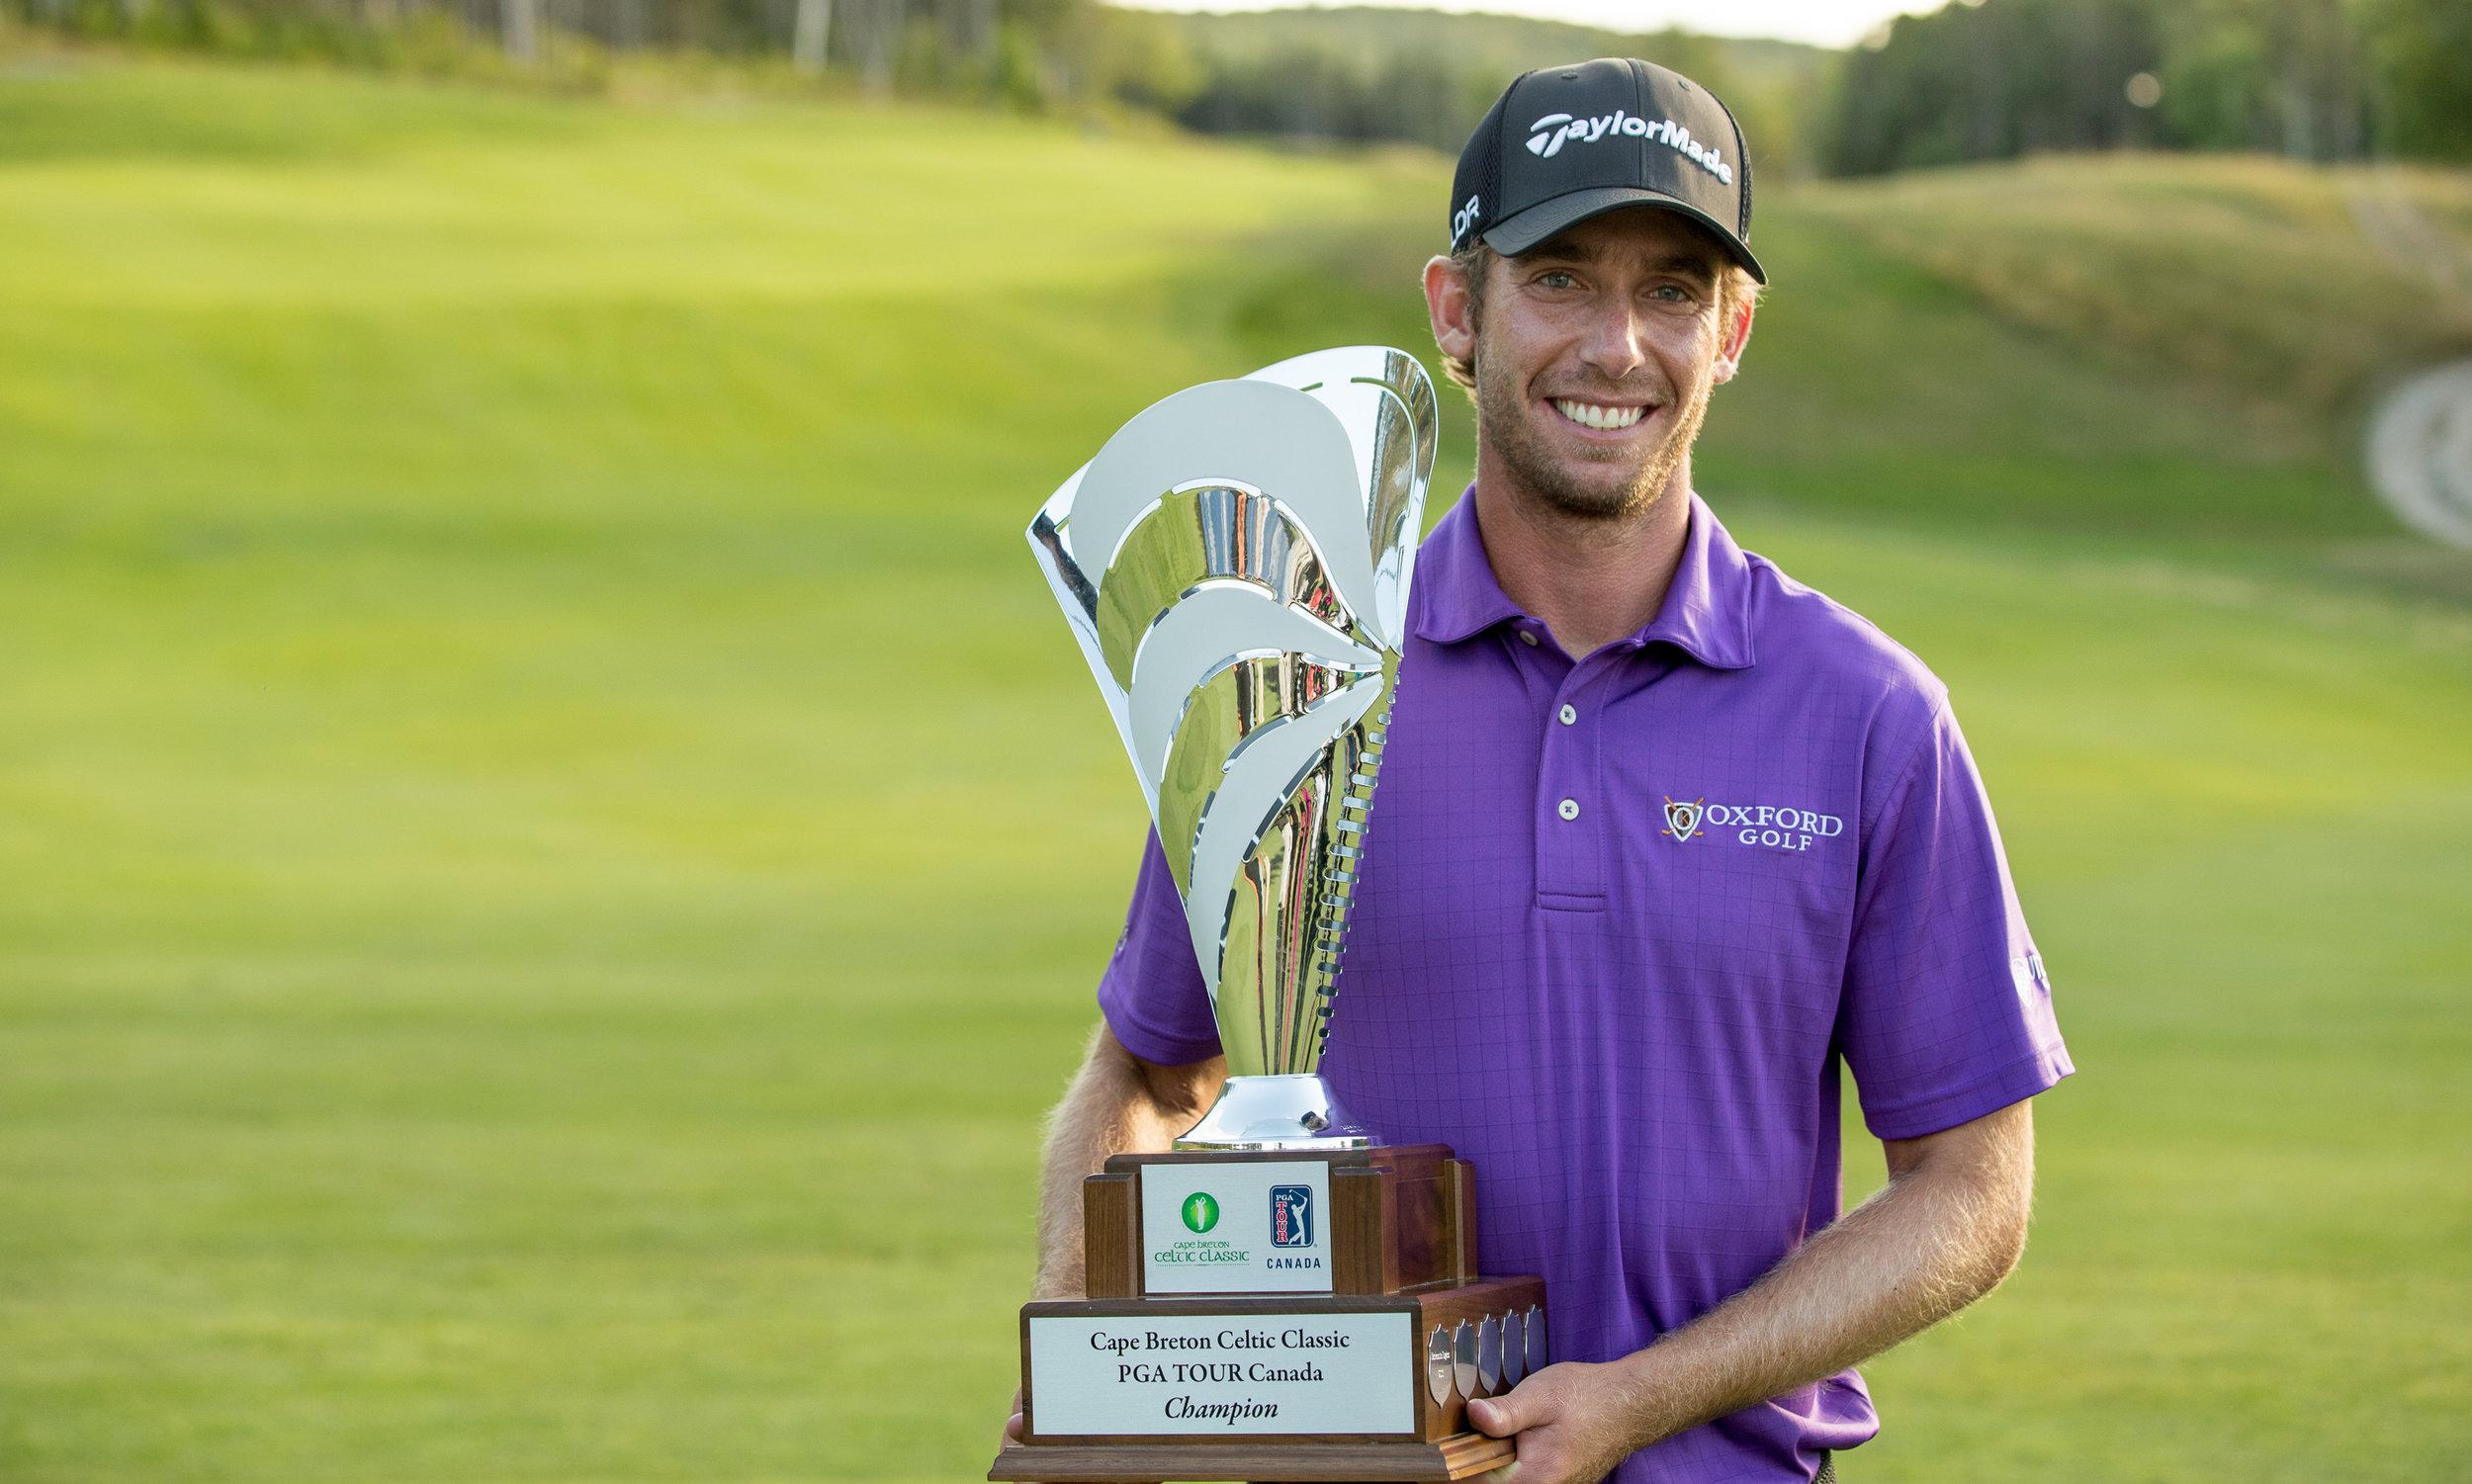 Mark Silvers - Web.com & PGA Tour Latinamerica